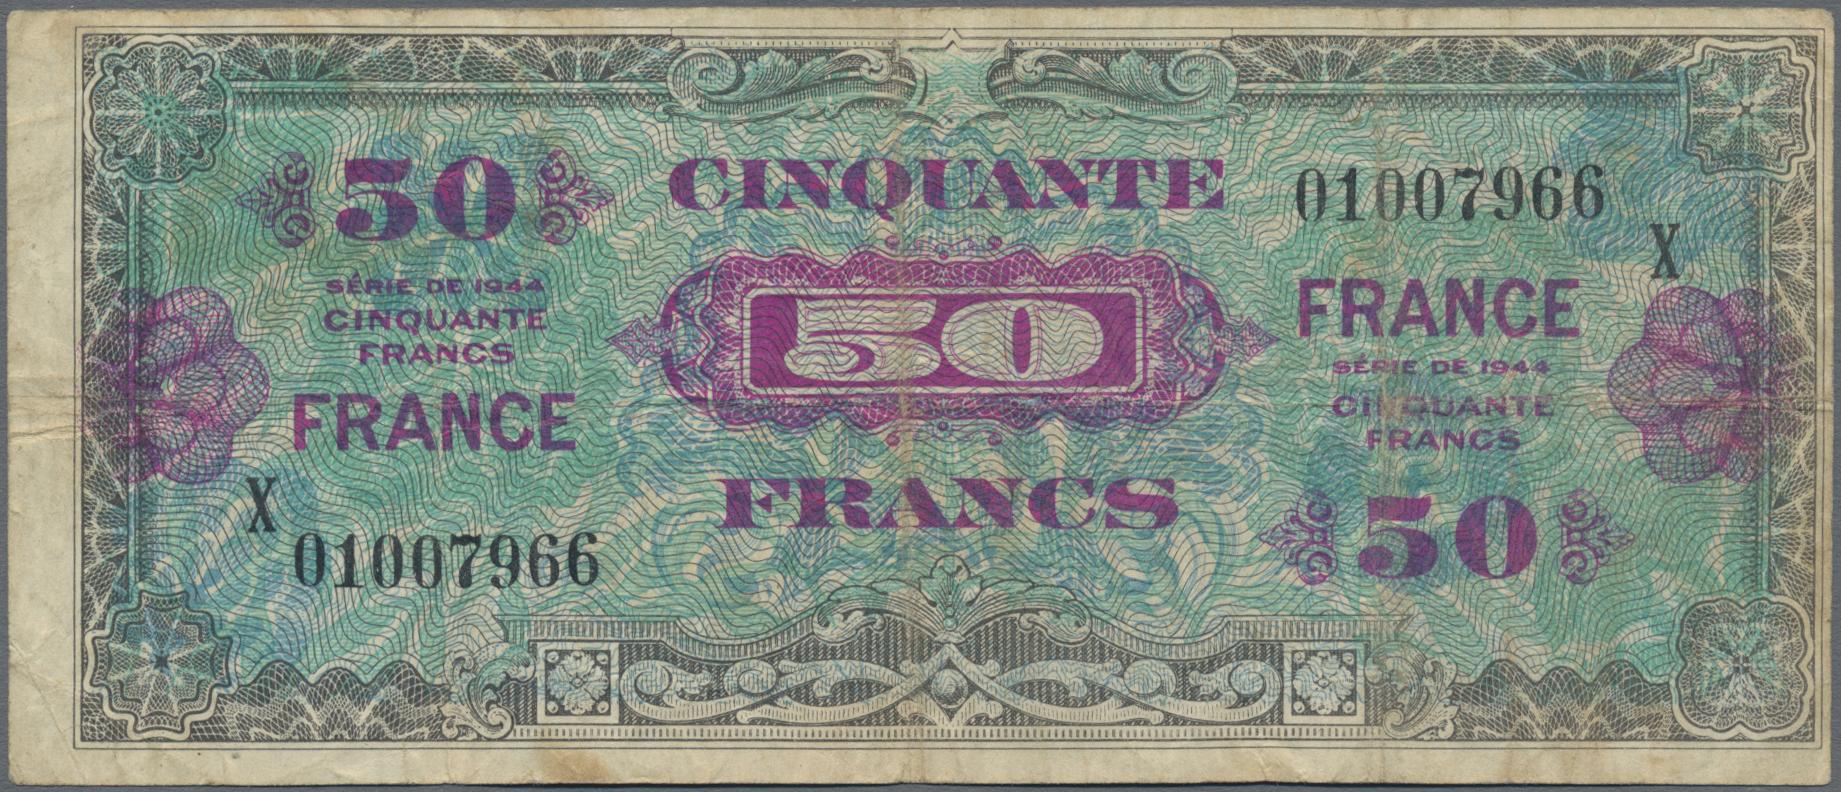 Lot 00312 - France / Frankreich | Banknoten  -  Auktionshaus Christoph Gärtner GmbH & Co. KG Sale #48 The Banknotes